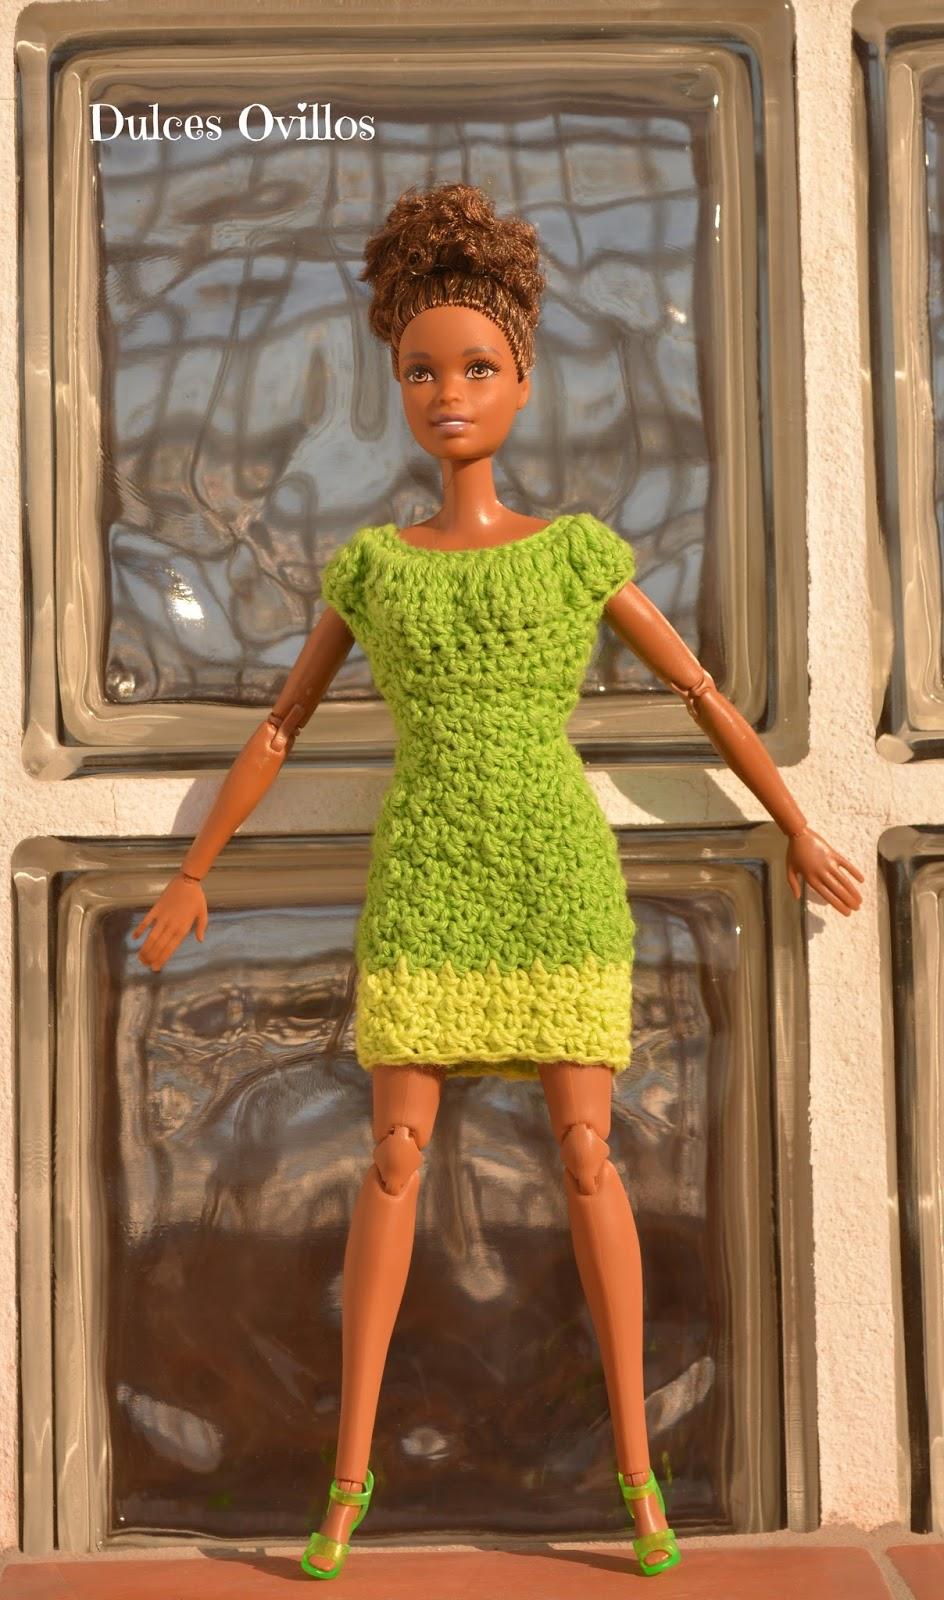 Dulces Ovillos: Vestido a crochet para Barbie - Crochet dress for ...